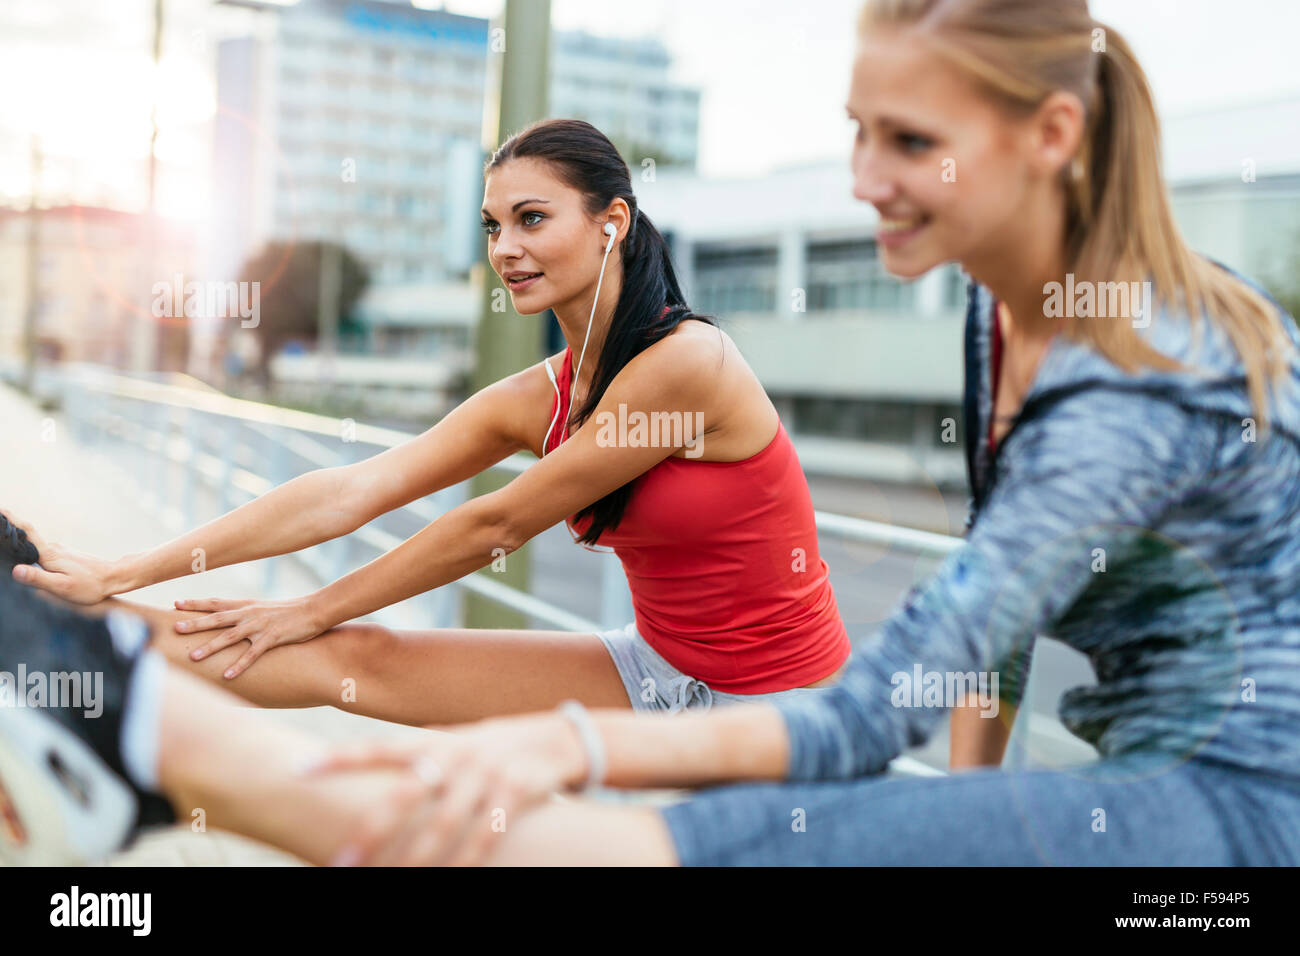 Zum Joggen durch Dehnung Füße Muskeln aufwärmen Stockbild